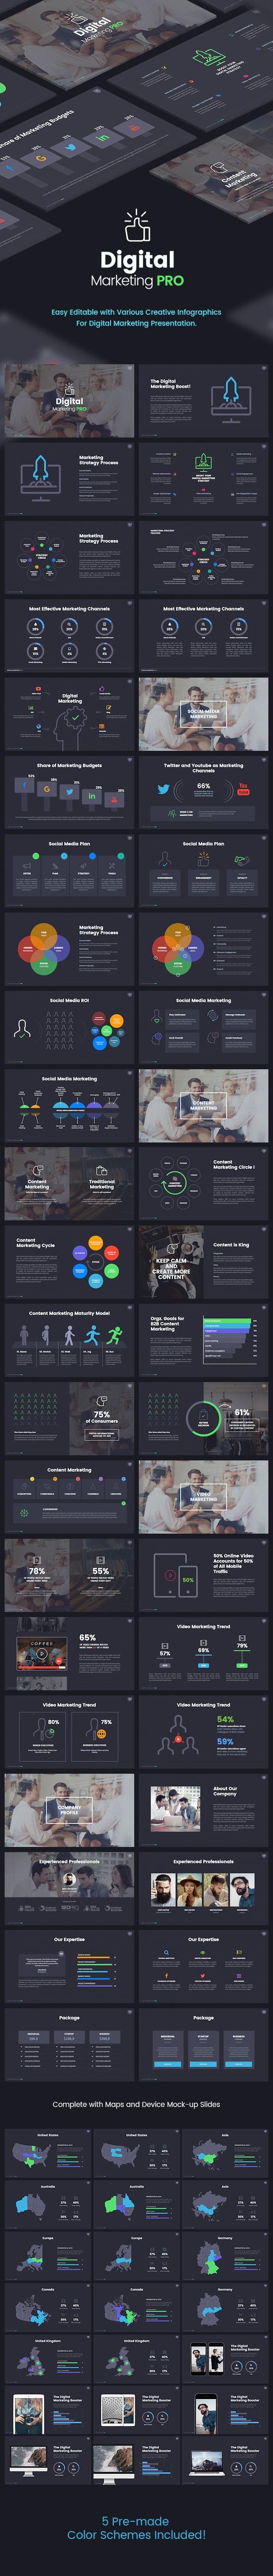 The Digital Marketing Pro - Keynote Template - Keynote Templates Presentation Templates